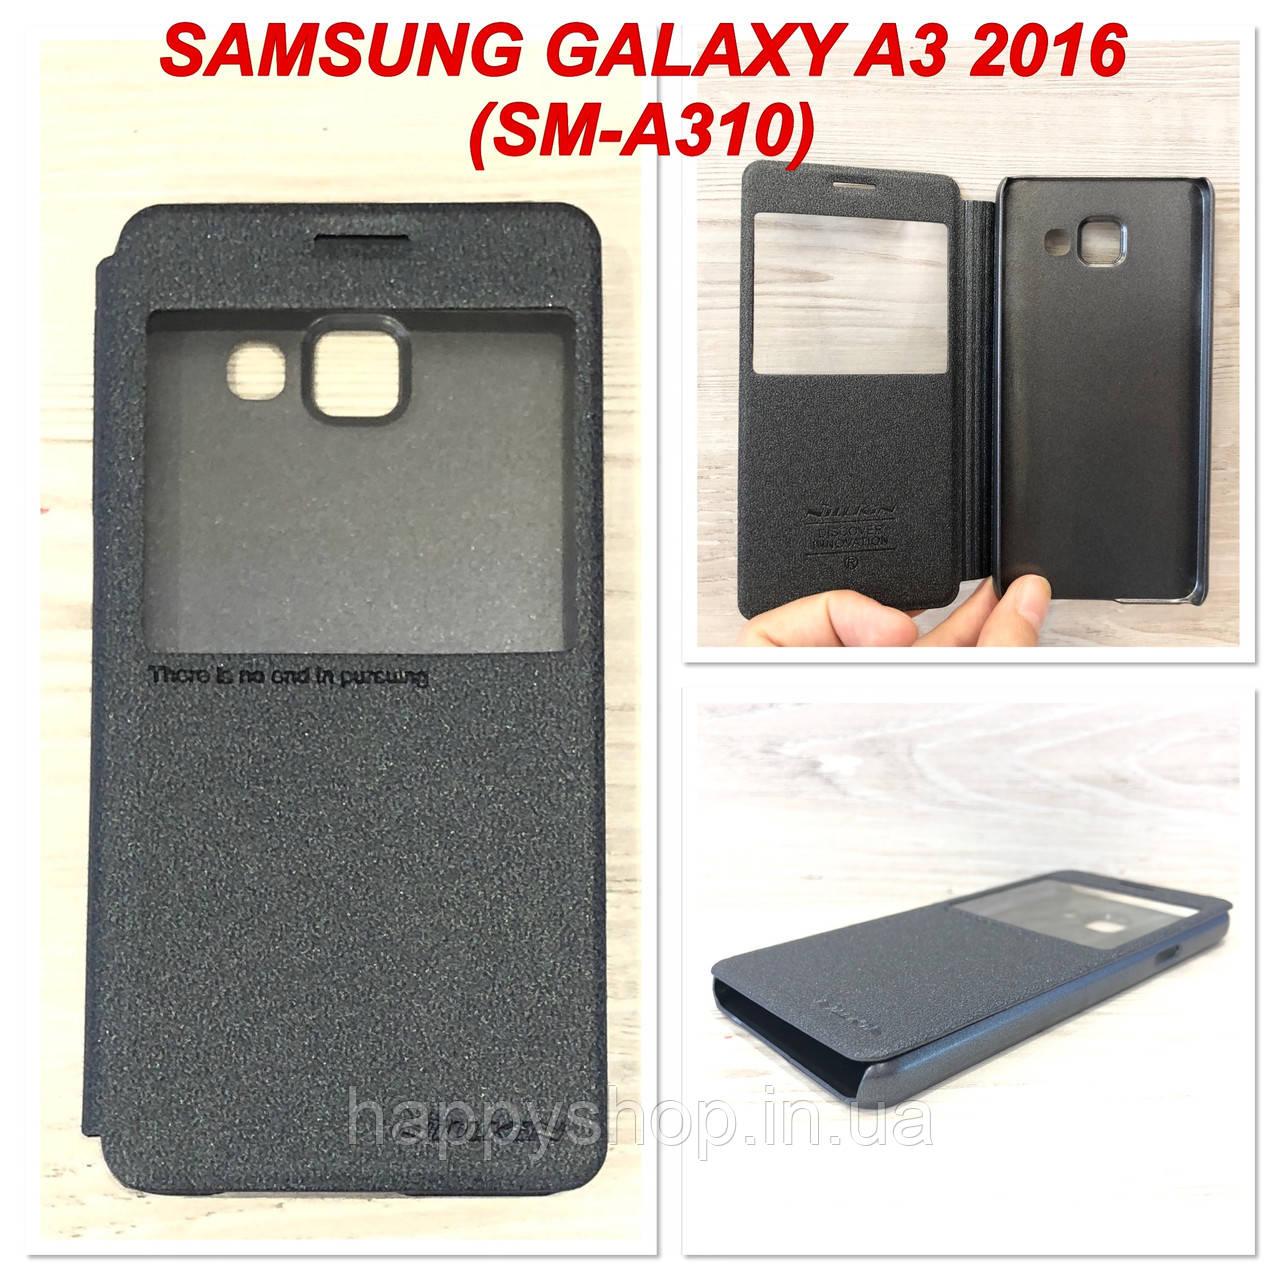 Чохол-книжка з віконцем Nillkin для Samsung Galaxy A3 2016 (SM-A310) Сірий